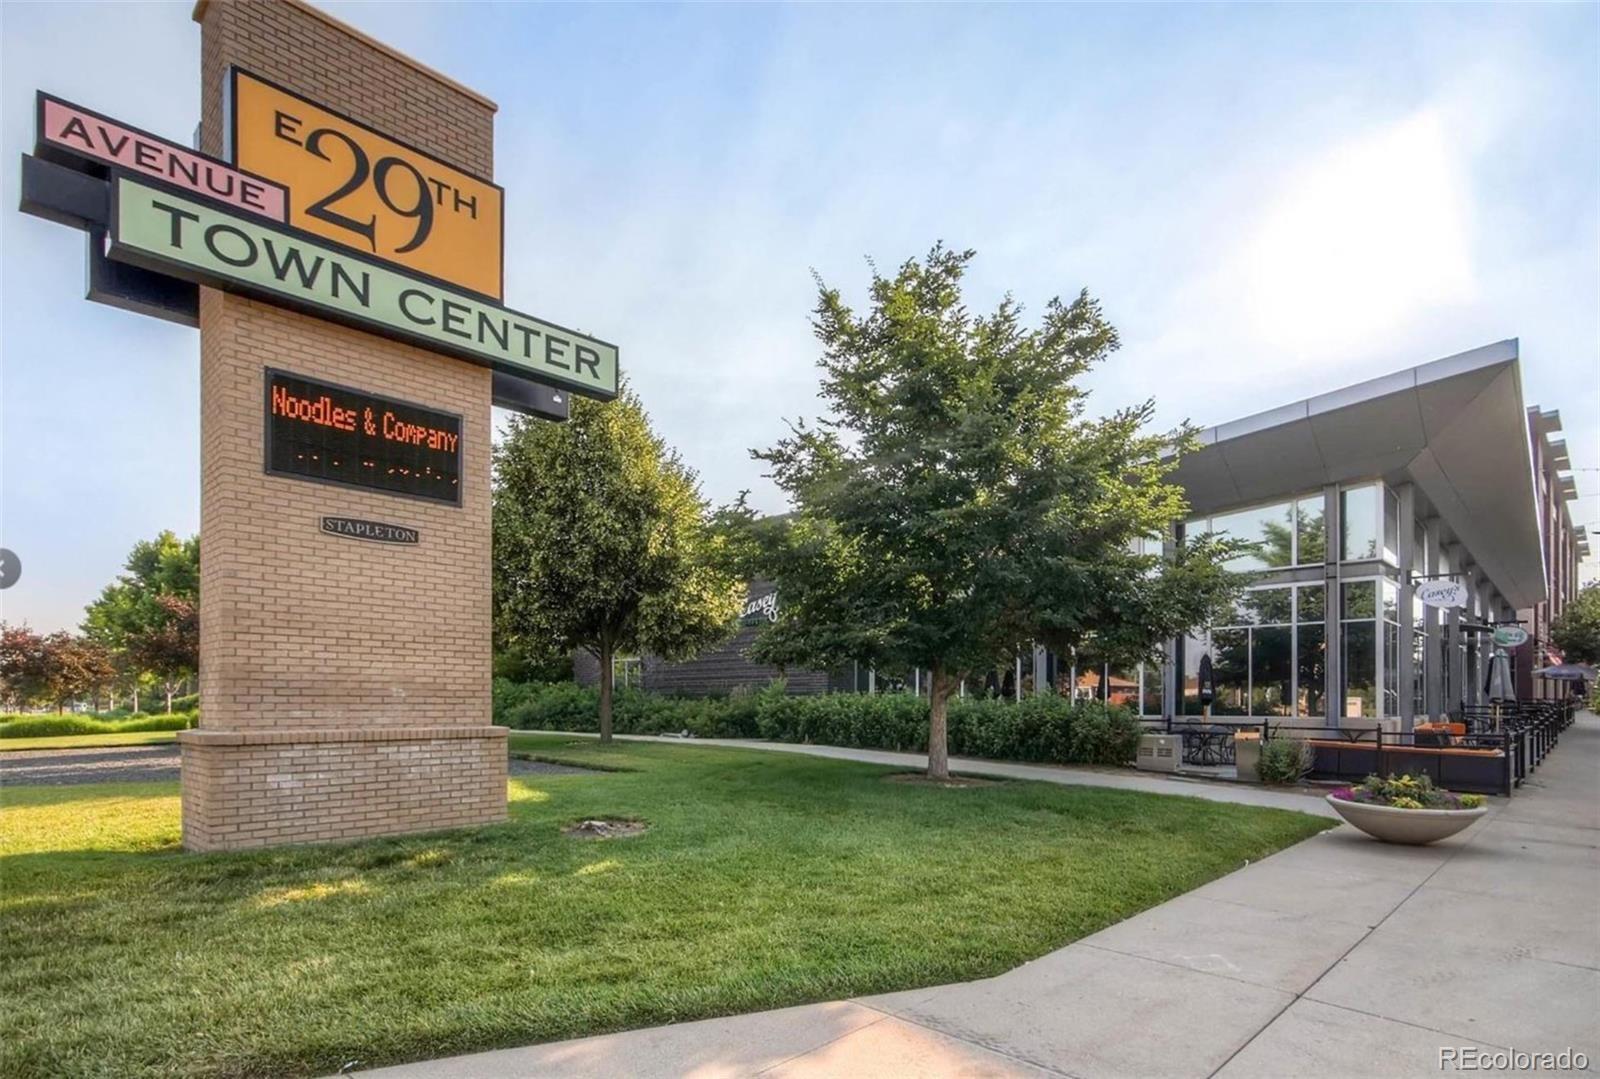 MLS# 8025899 - 20 - 7752 E 29th Avenue, Denver, CO 80238